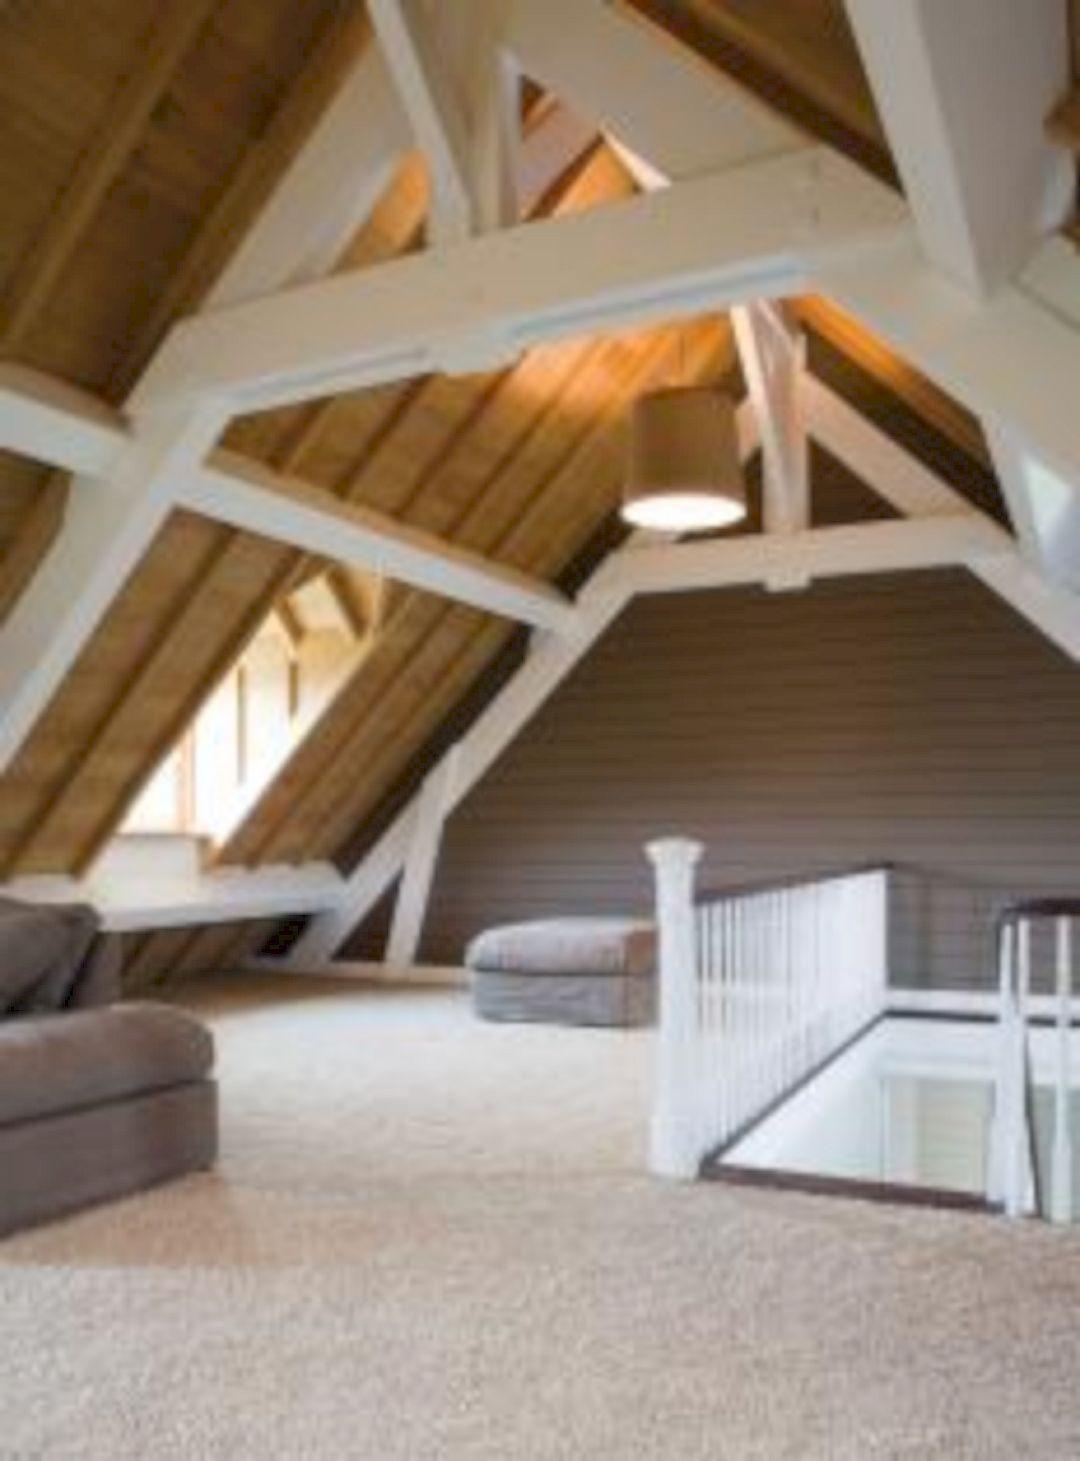 St Joseph Loft Transformation Of A Bedroom Loft Into A Quiet And Warm Space Attic Renovation Attic Remodel Attic Rooms